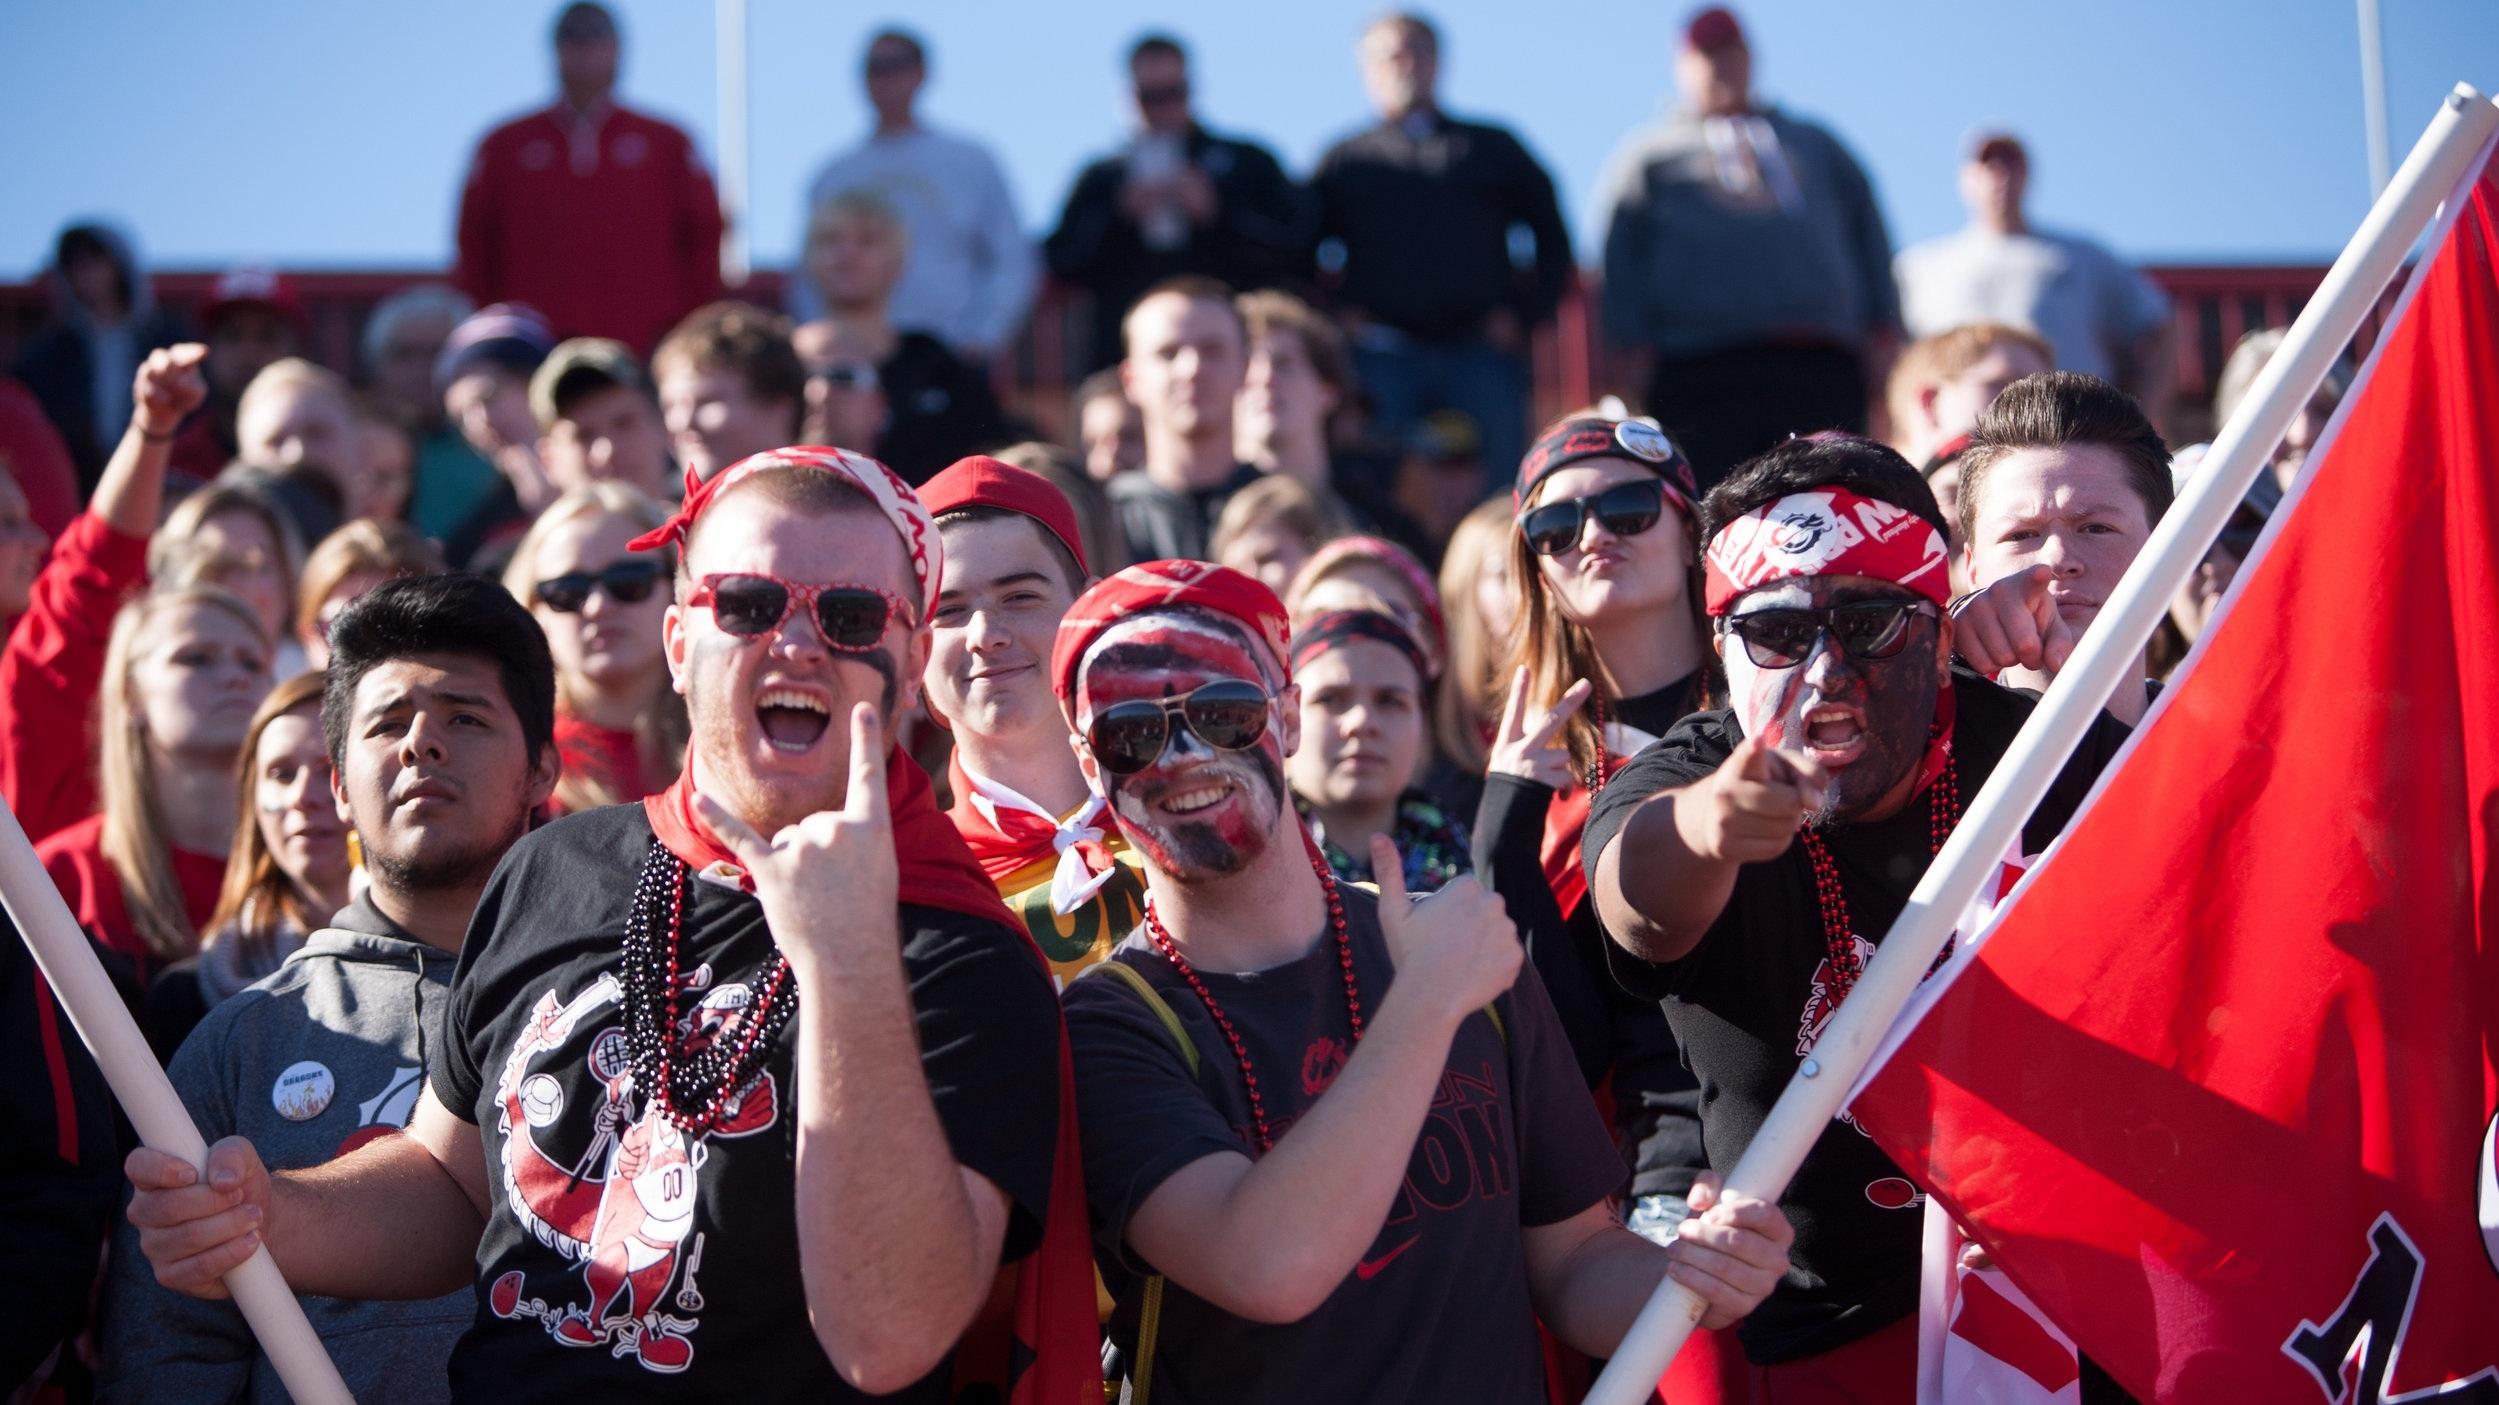 Photo courtesy Minnesota State University Moorhead Athletics